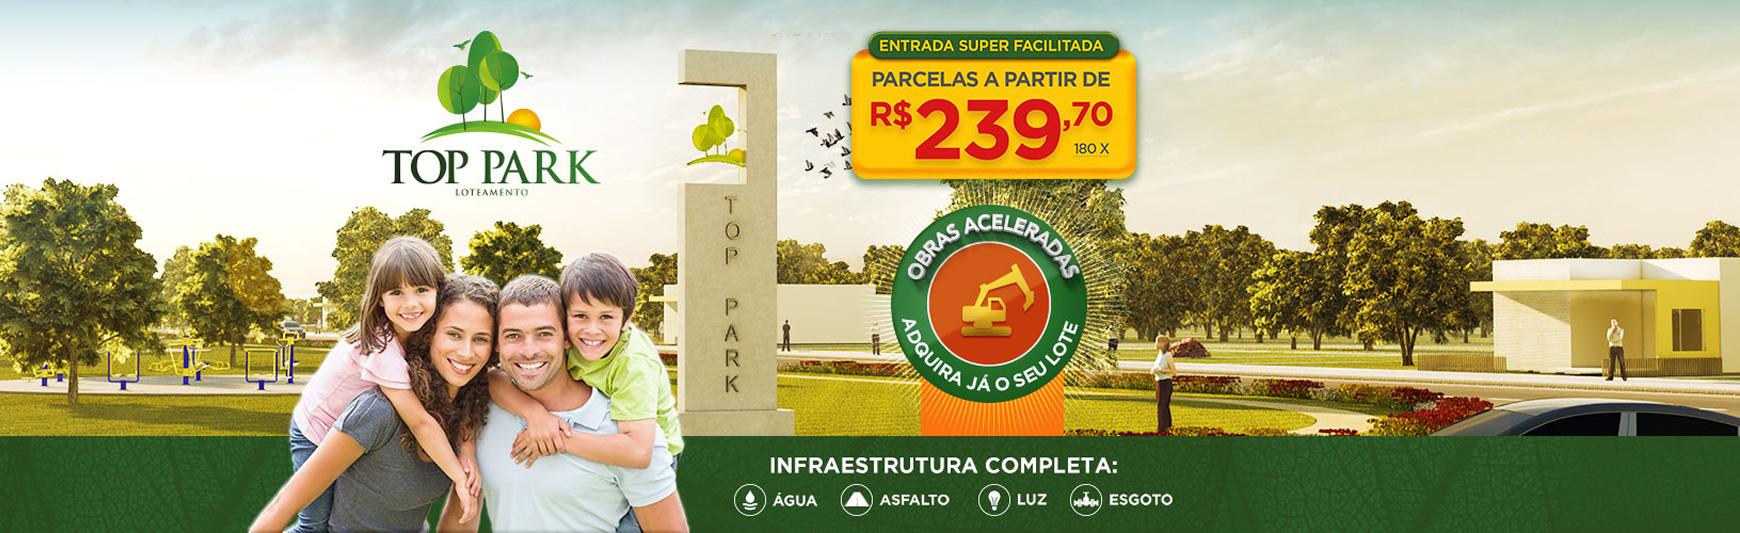 (c) Terramac.com.br